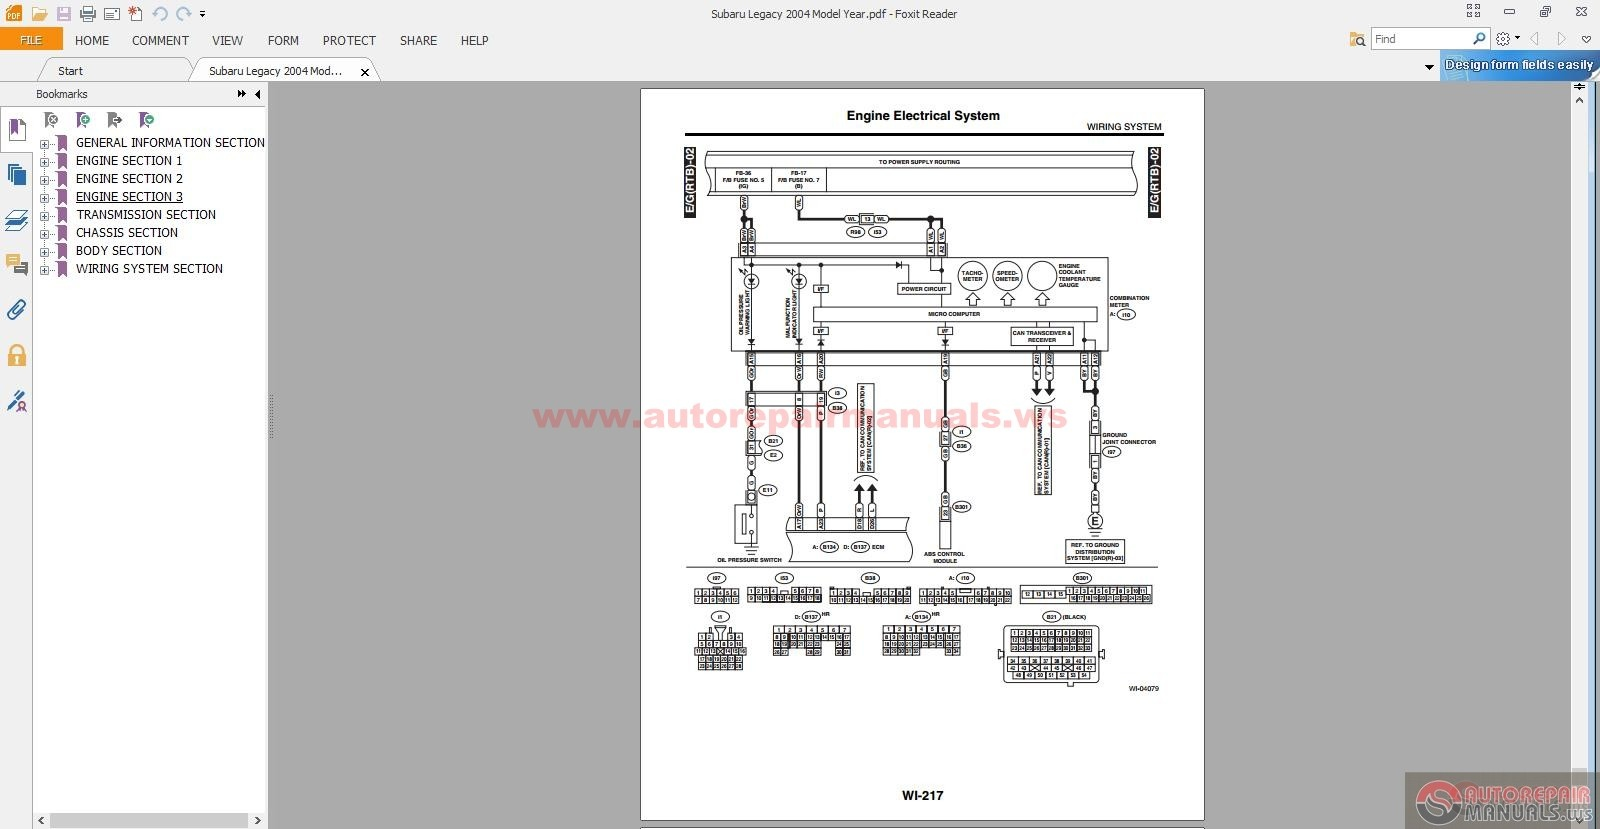 1996 subaru legacy service manual pdf